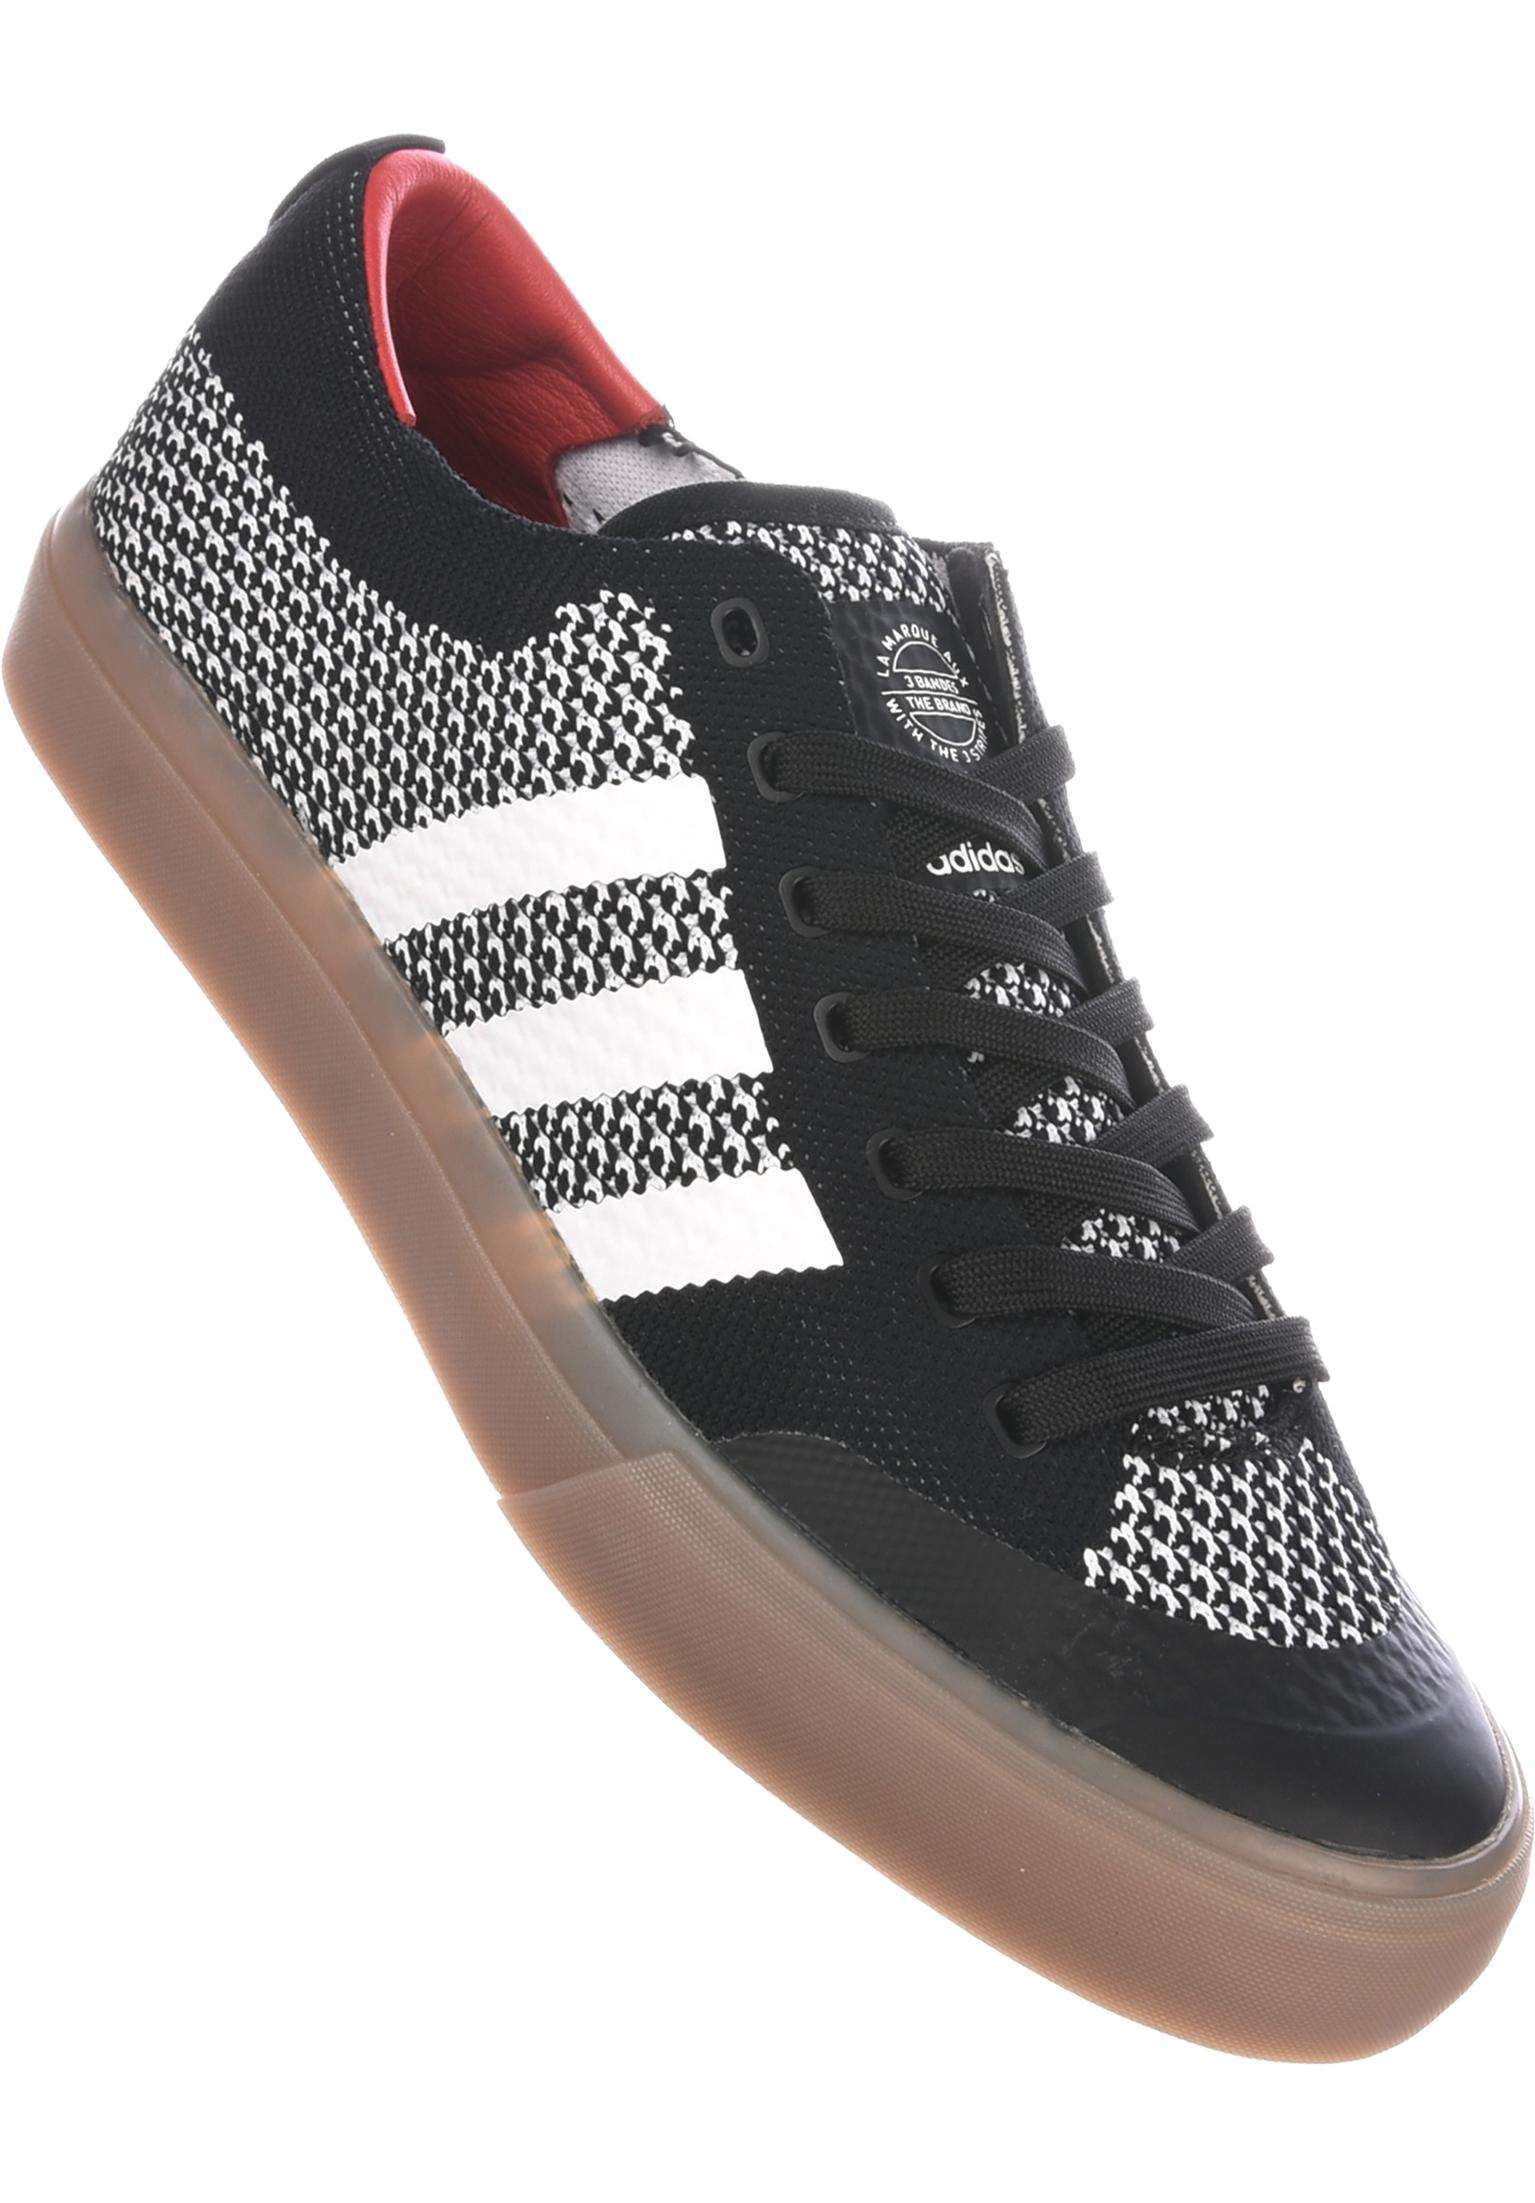 Matchcourt Primeknit adidas-skateboarding Tutte le scarpe in coreblack-gum  da Uomo  a5cc13bf011